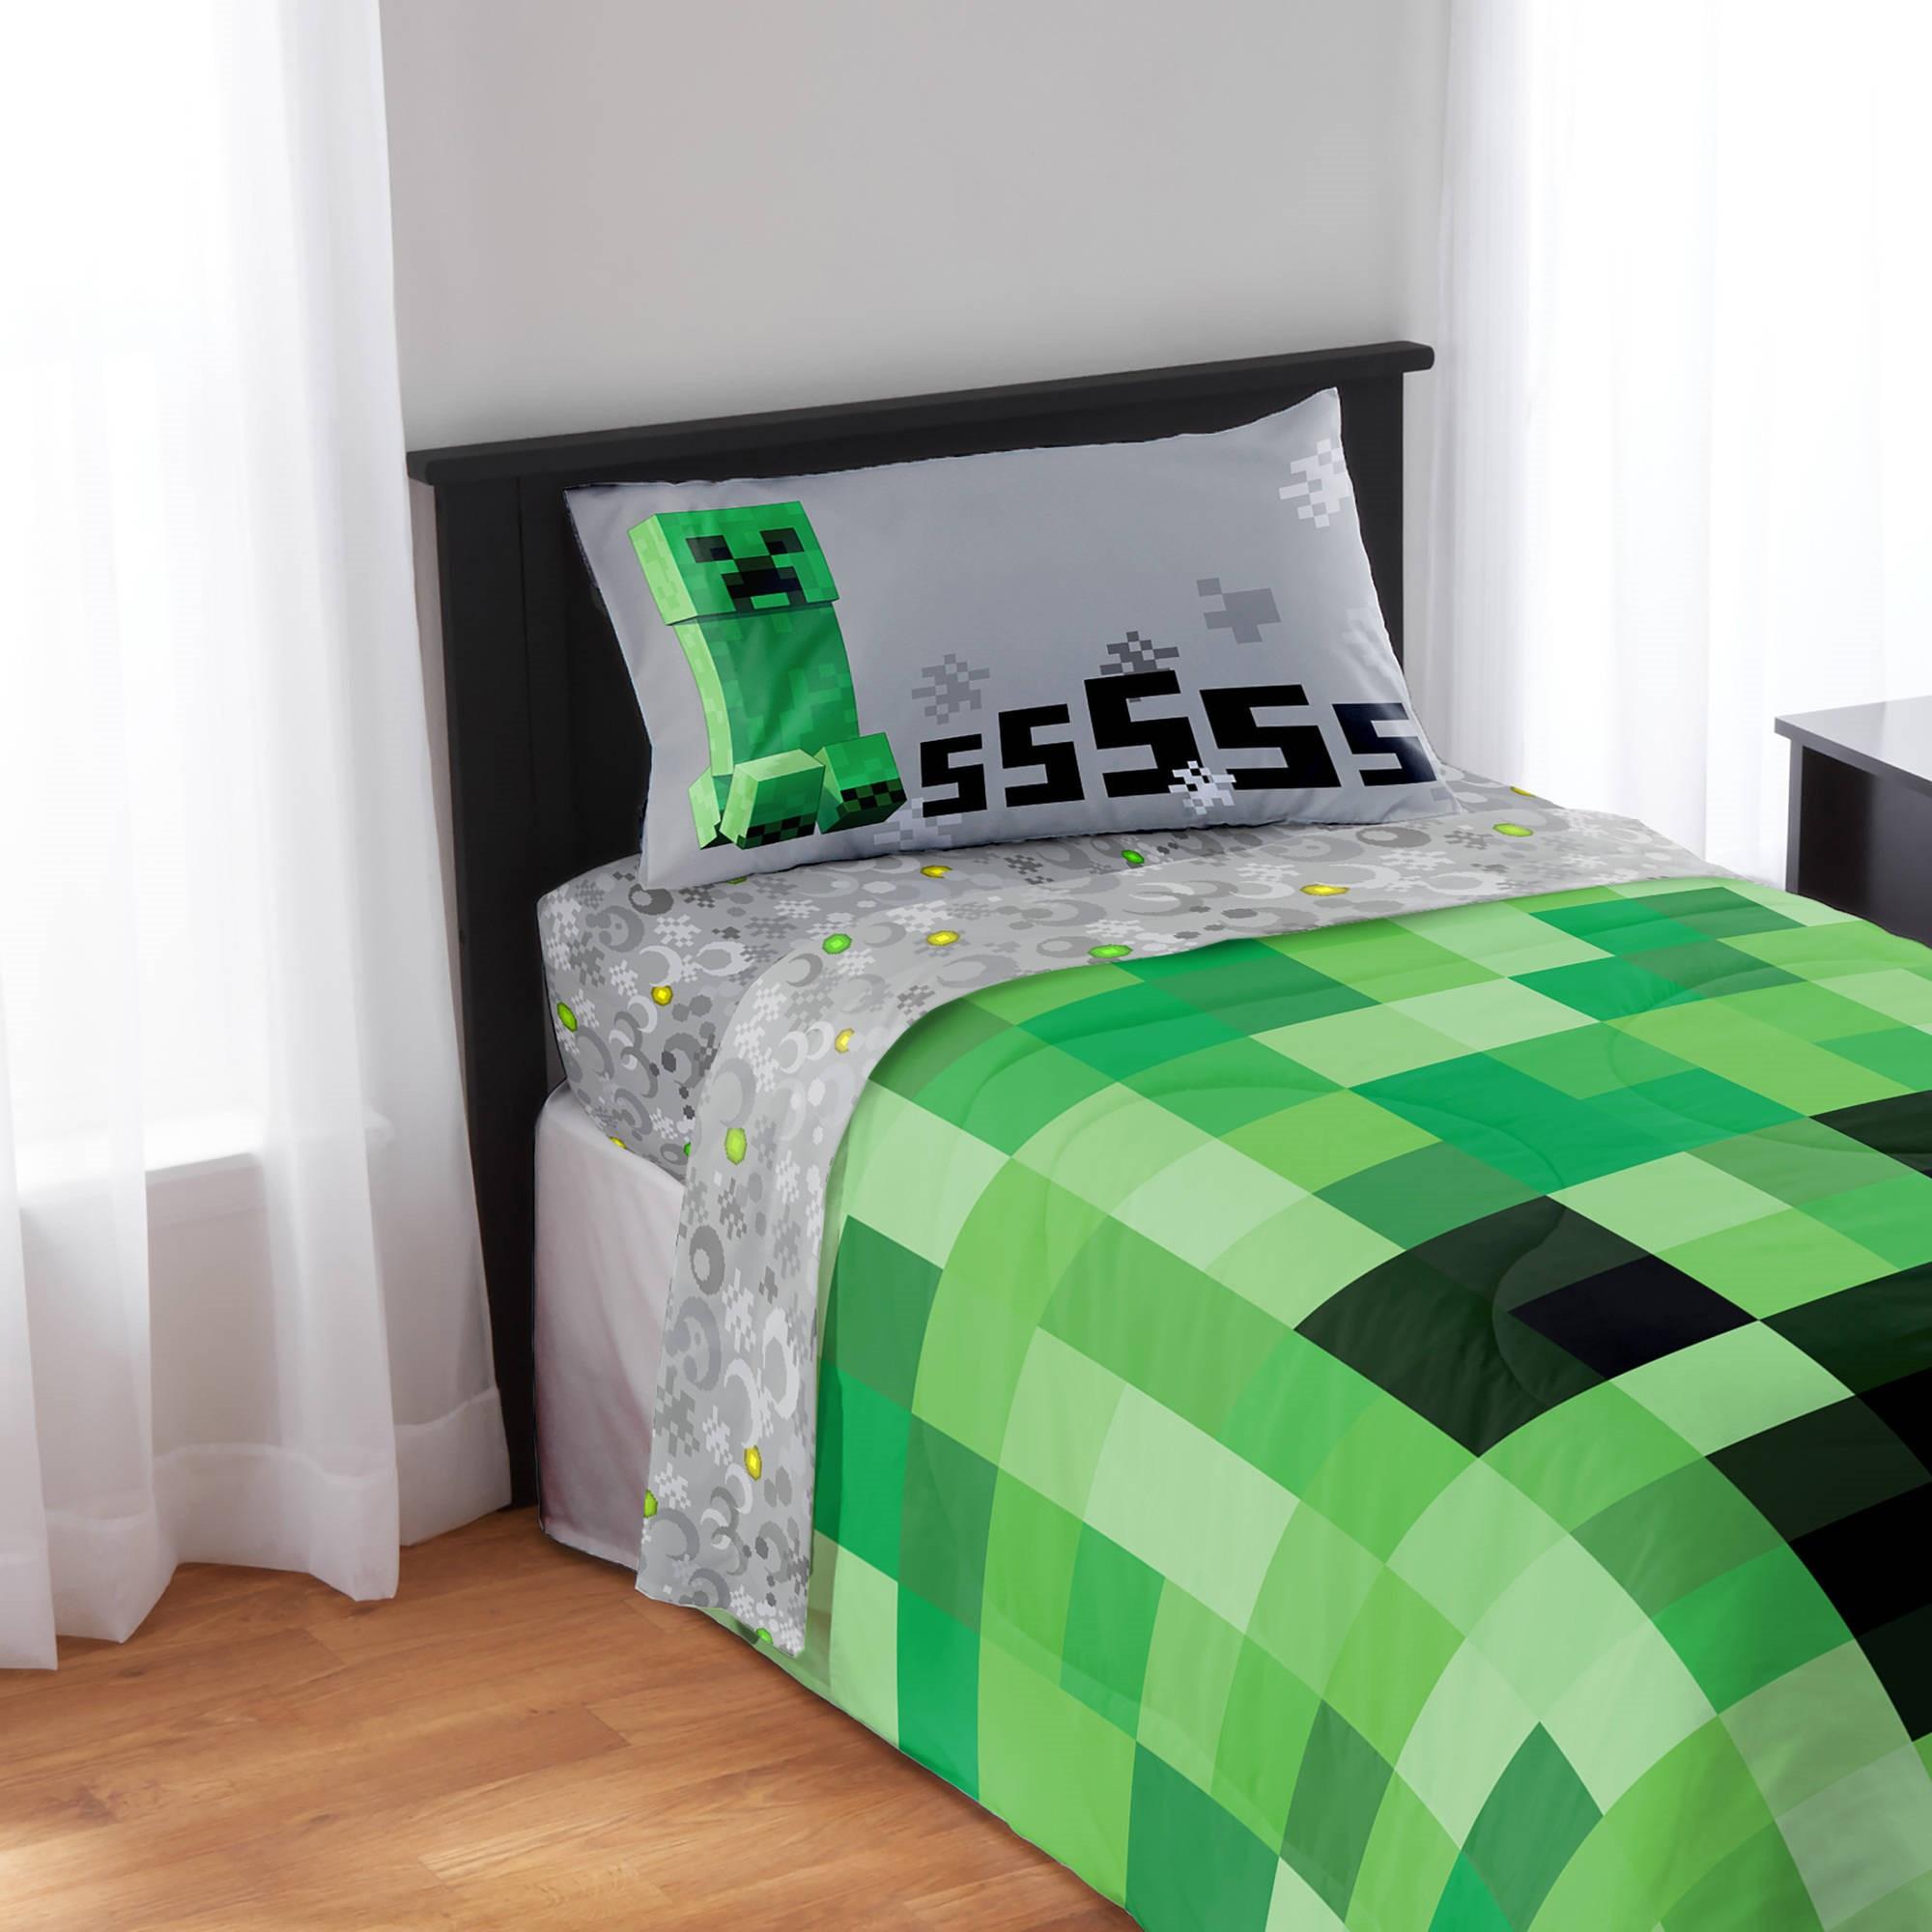 Minecraft Bedding Sheet Set